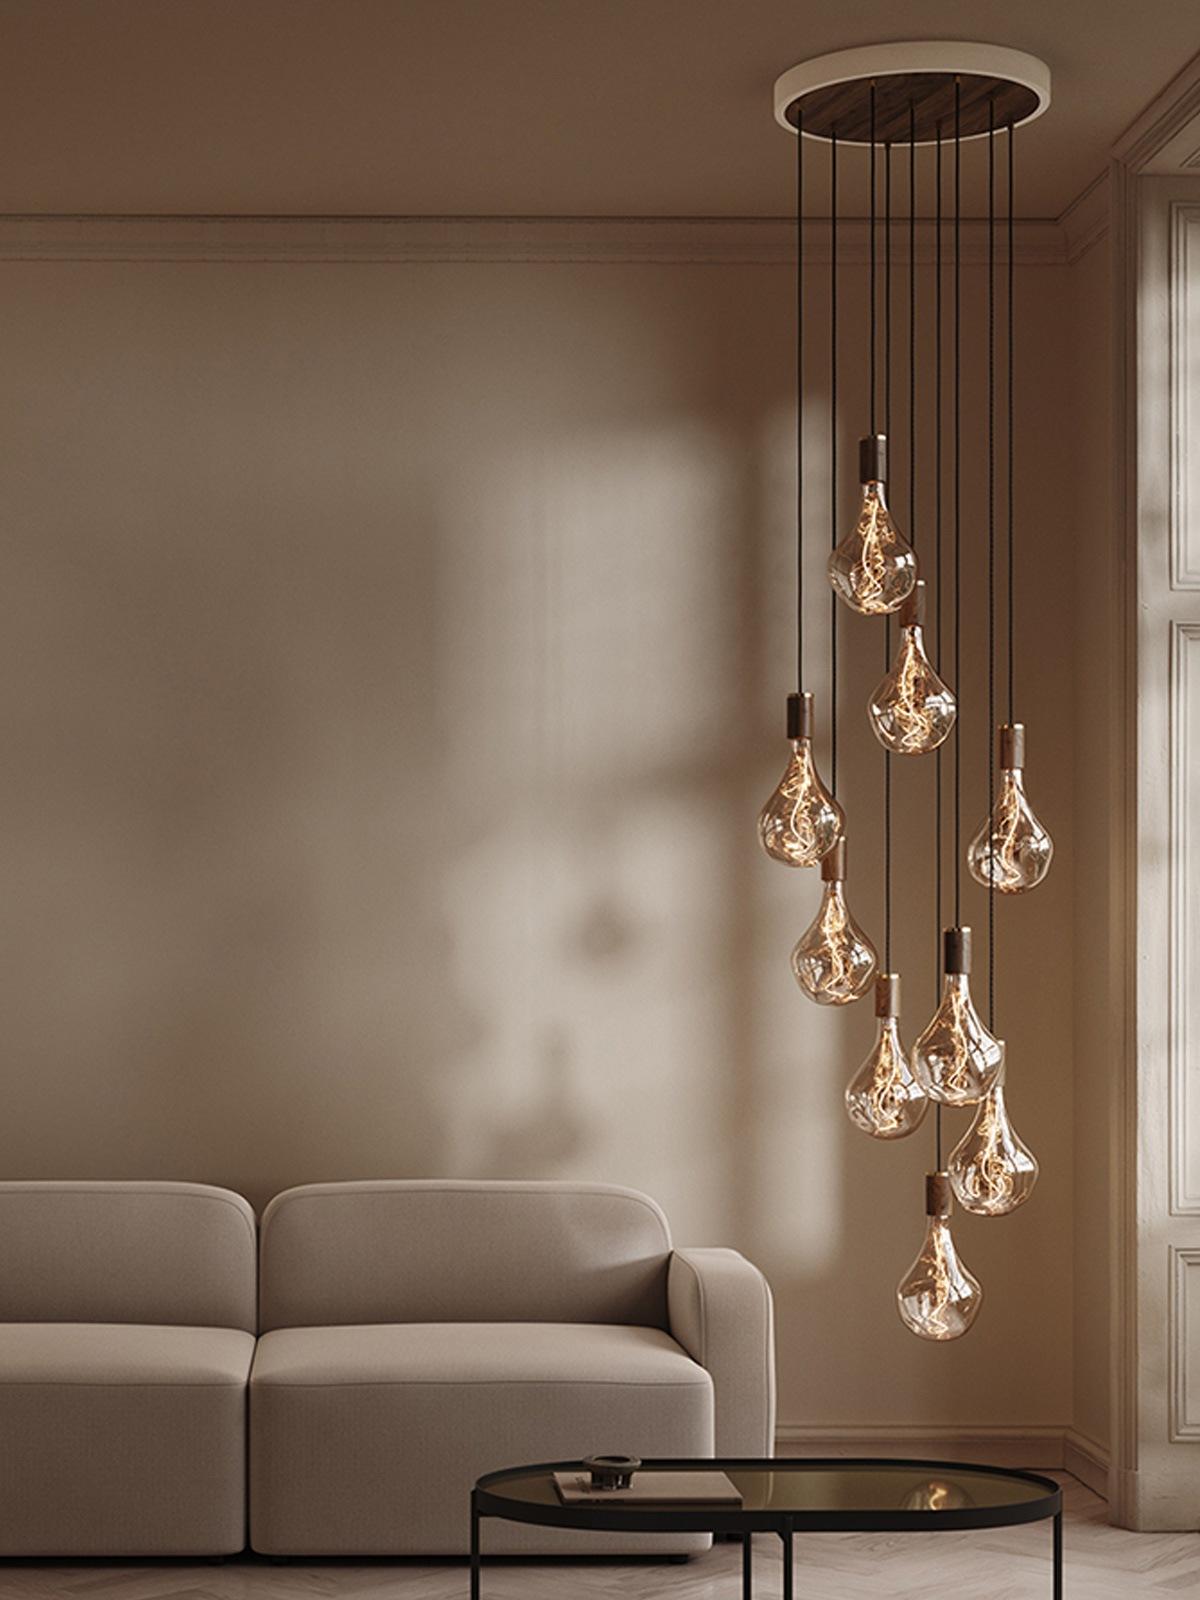 Large Pendant Cluster Leuchte Tala DesignOrt Onlineshop Berlin Lampen